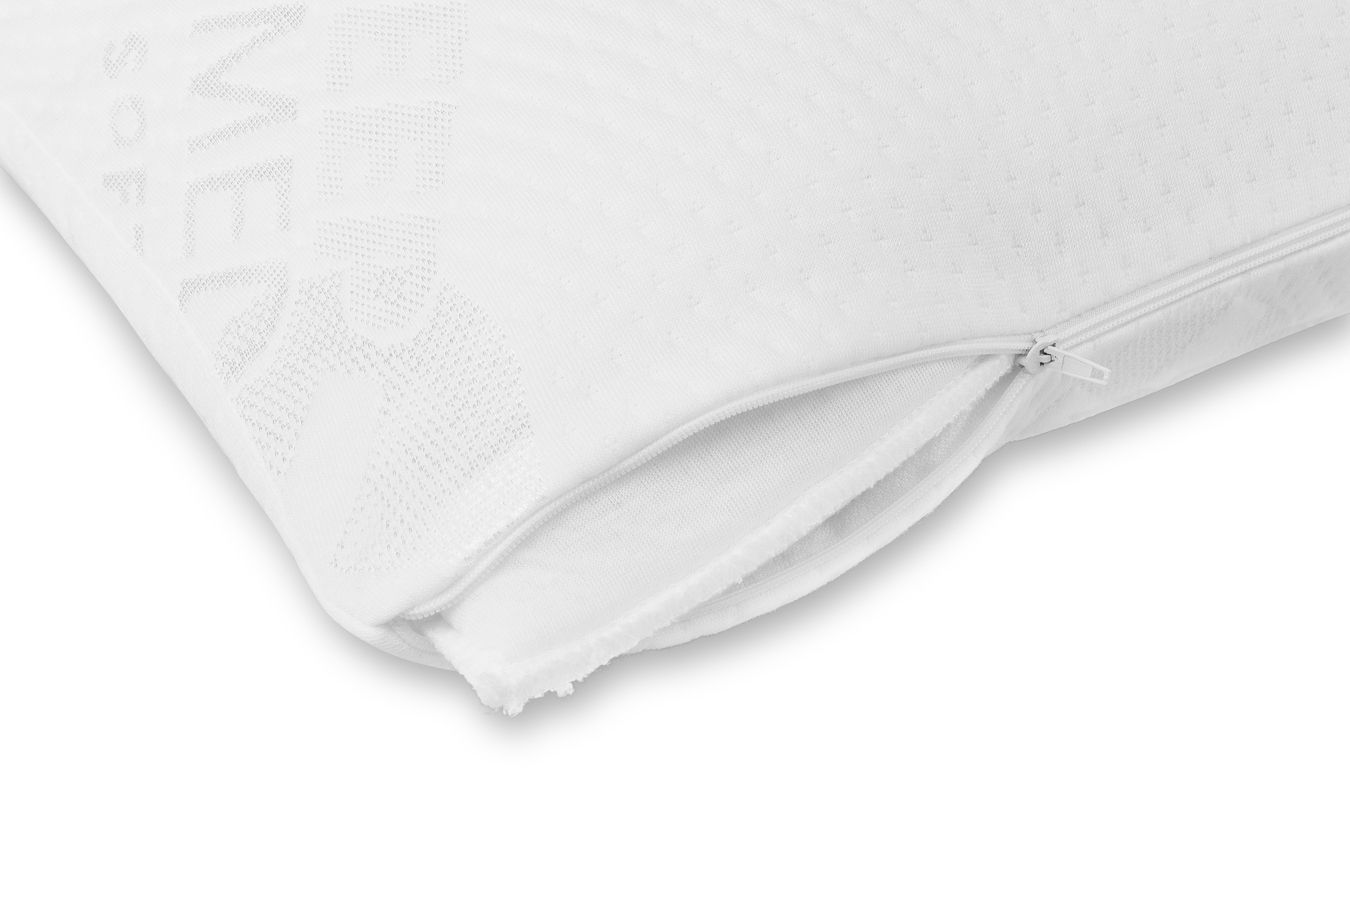 Sleep Med Kussen : Sleepmed memory foam kussen internet s best online offer